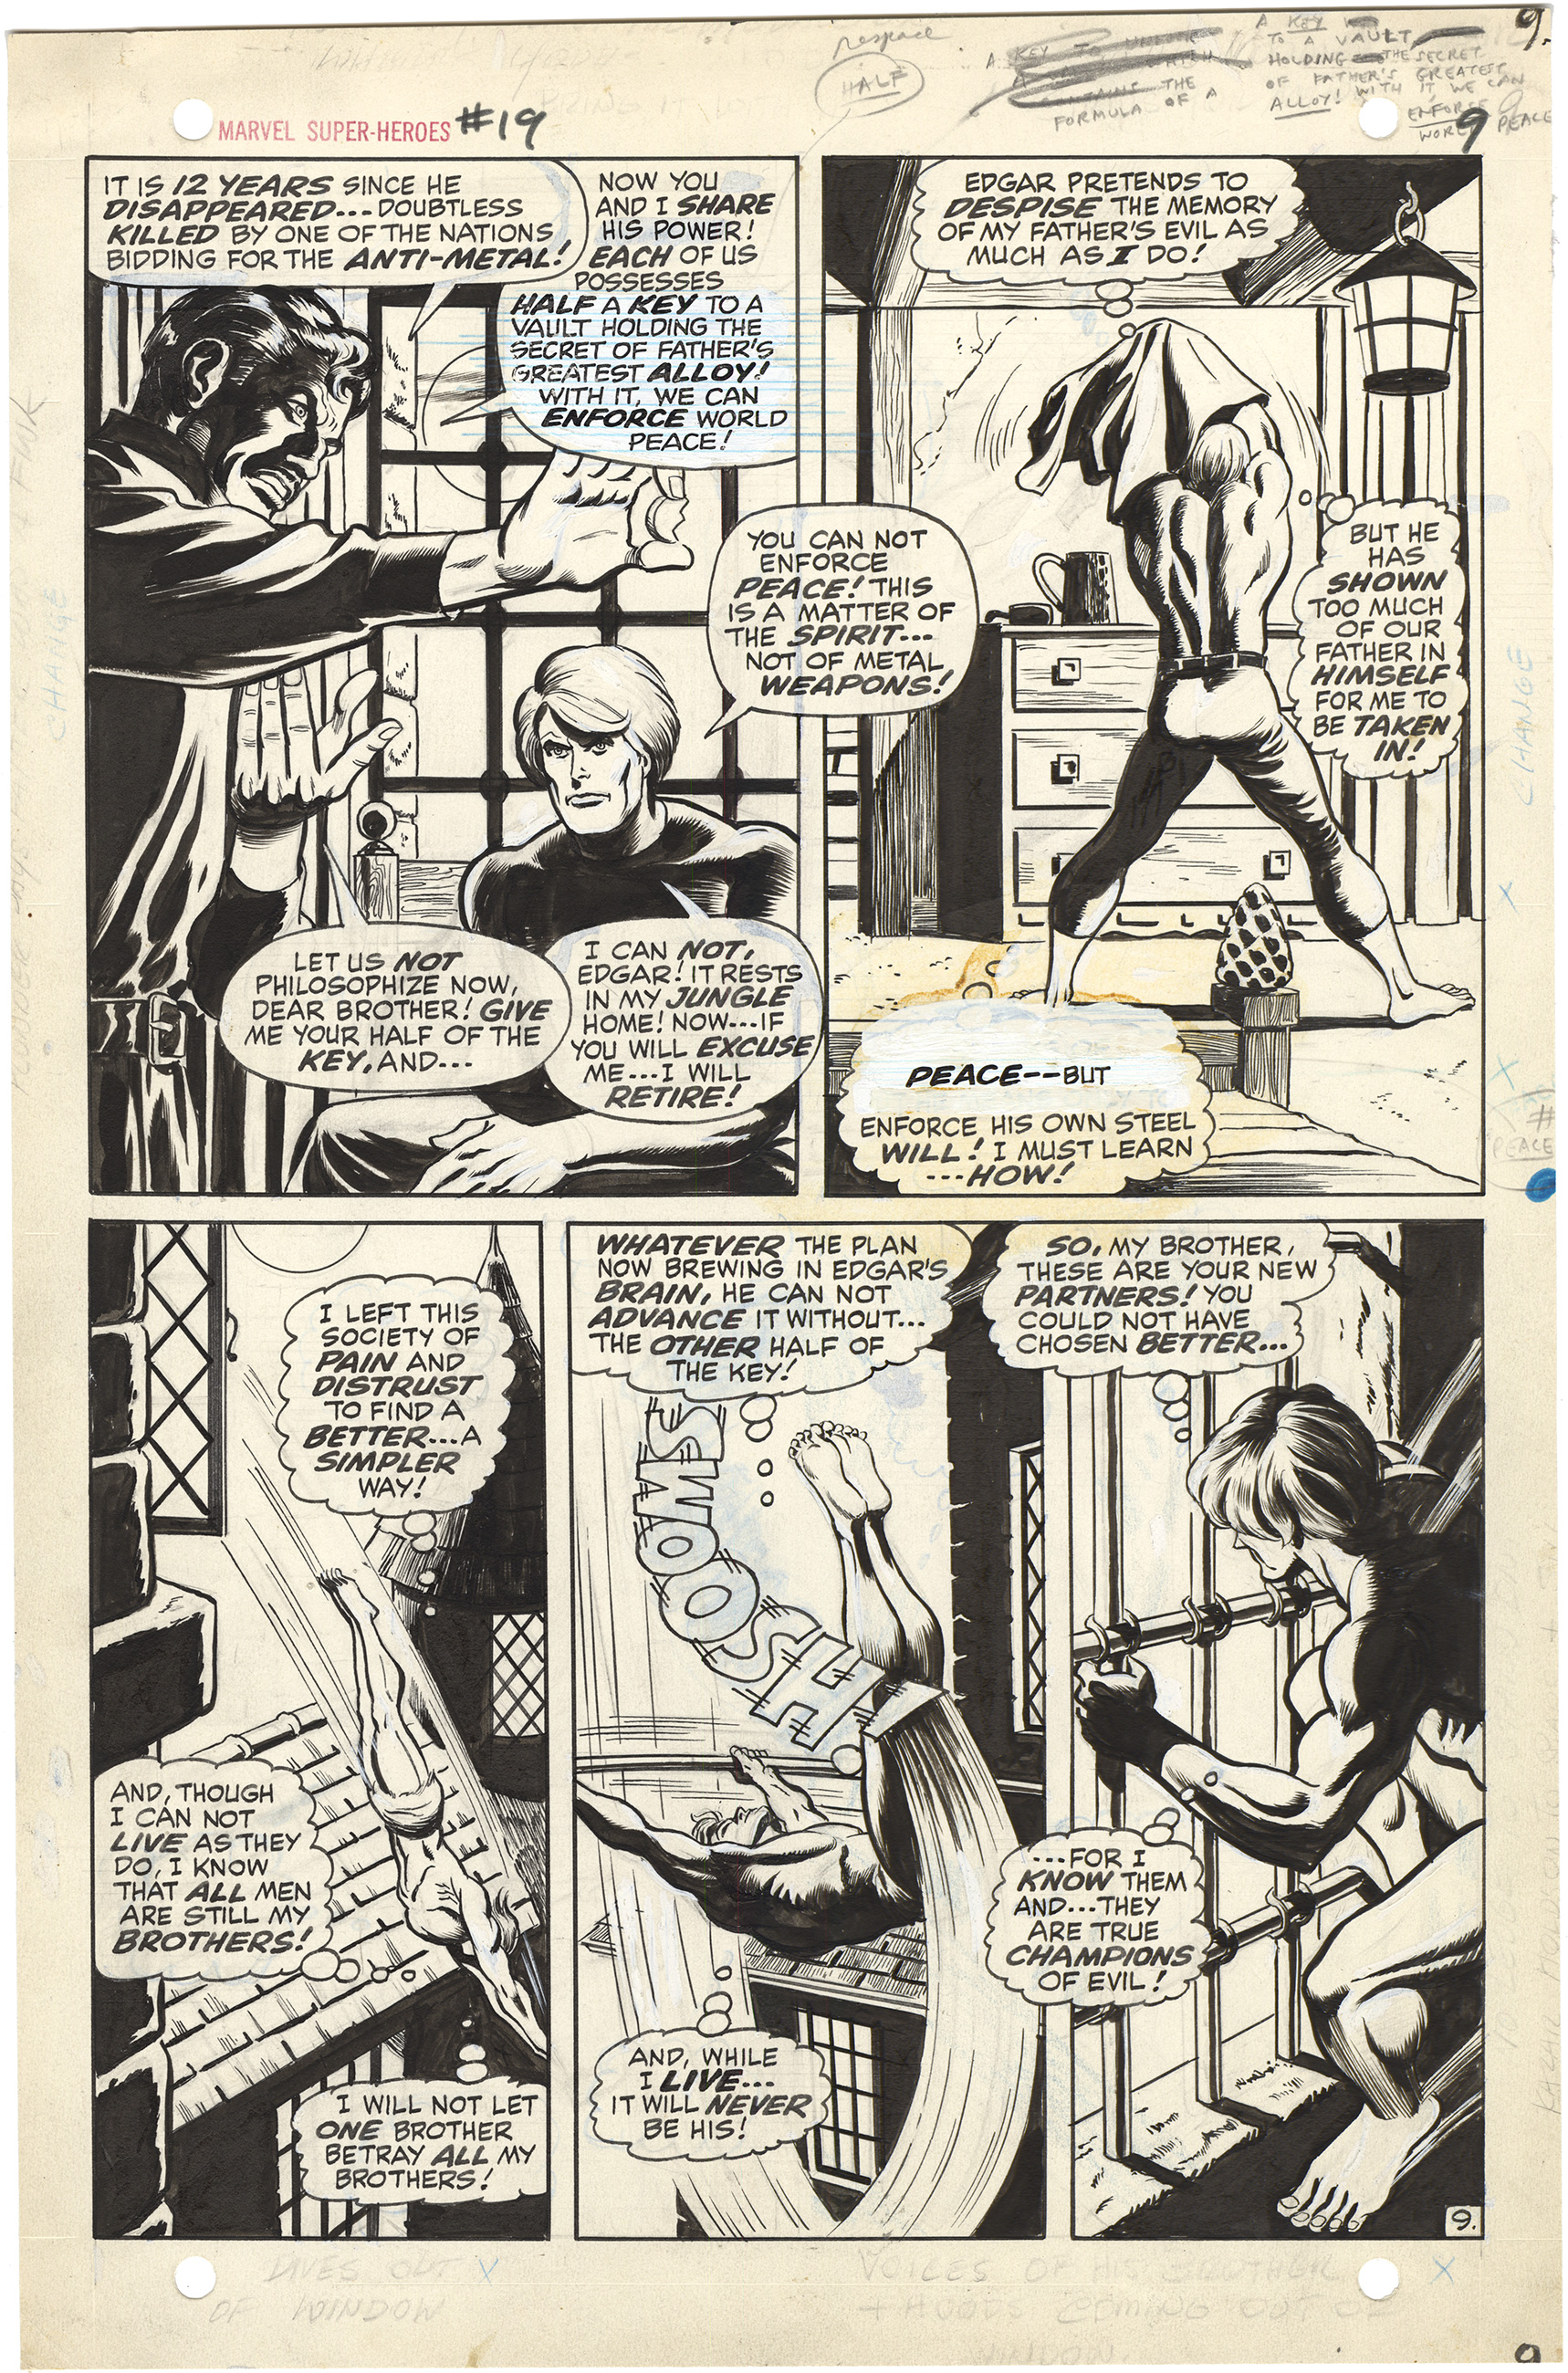 Marvel Super-Heroes #19 p9